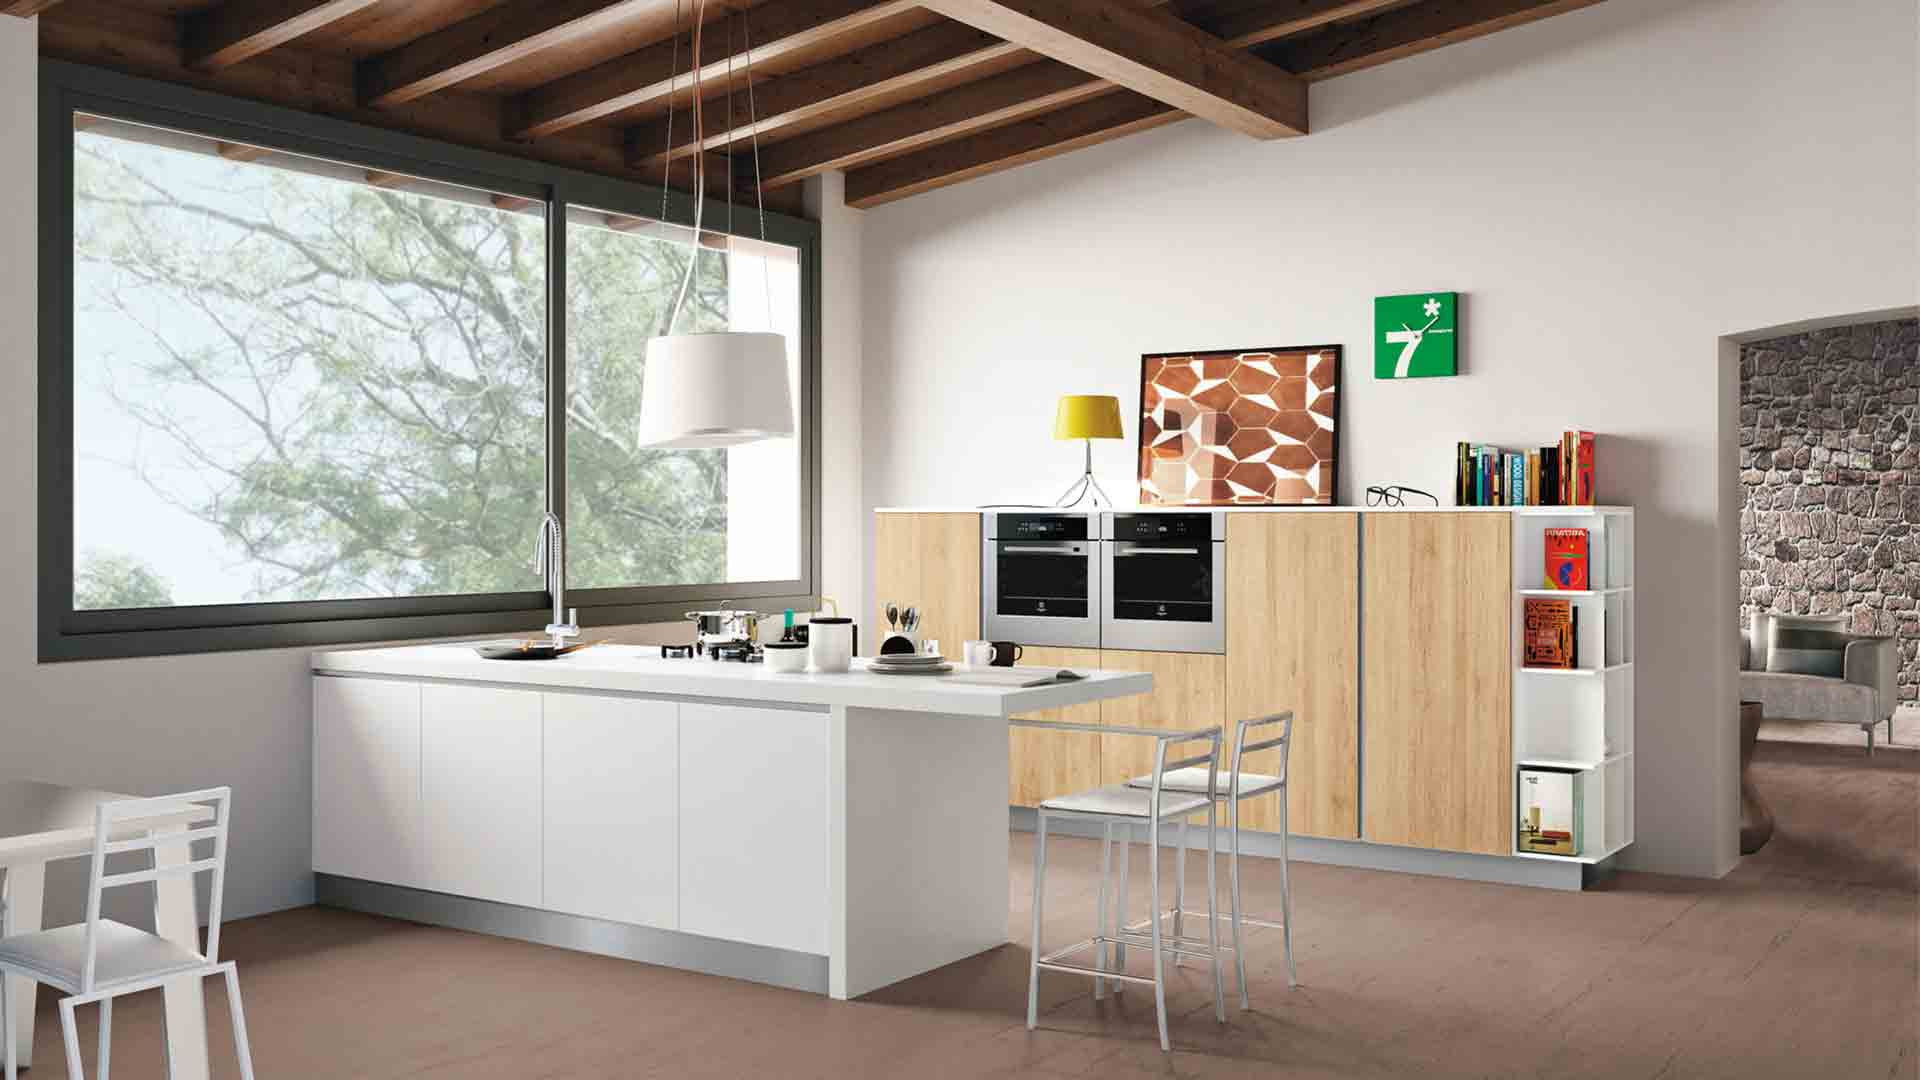 Ank - Cucine Moderne - Creo Kitchens